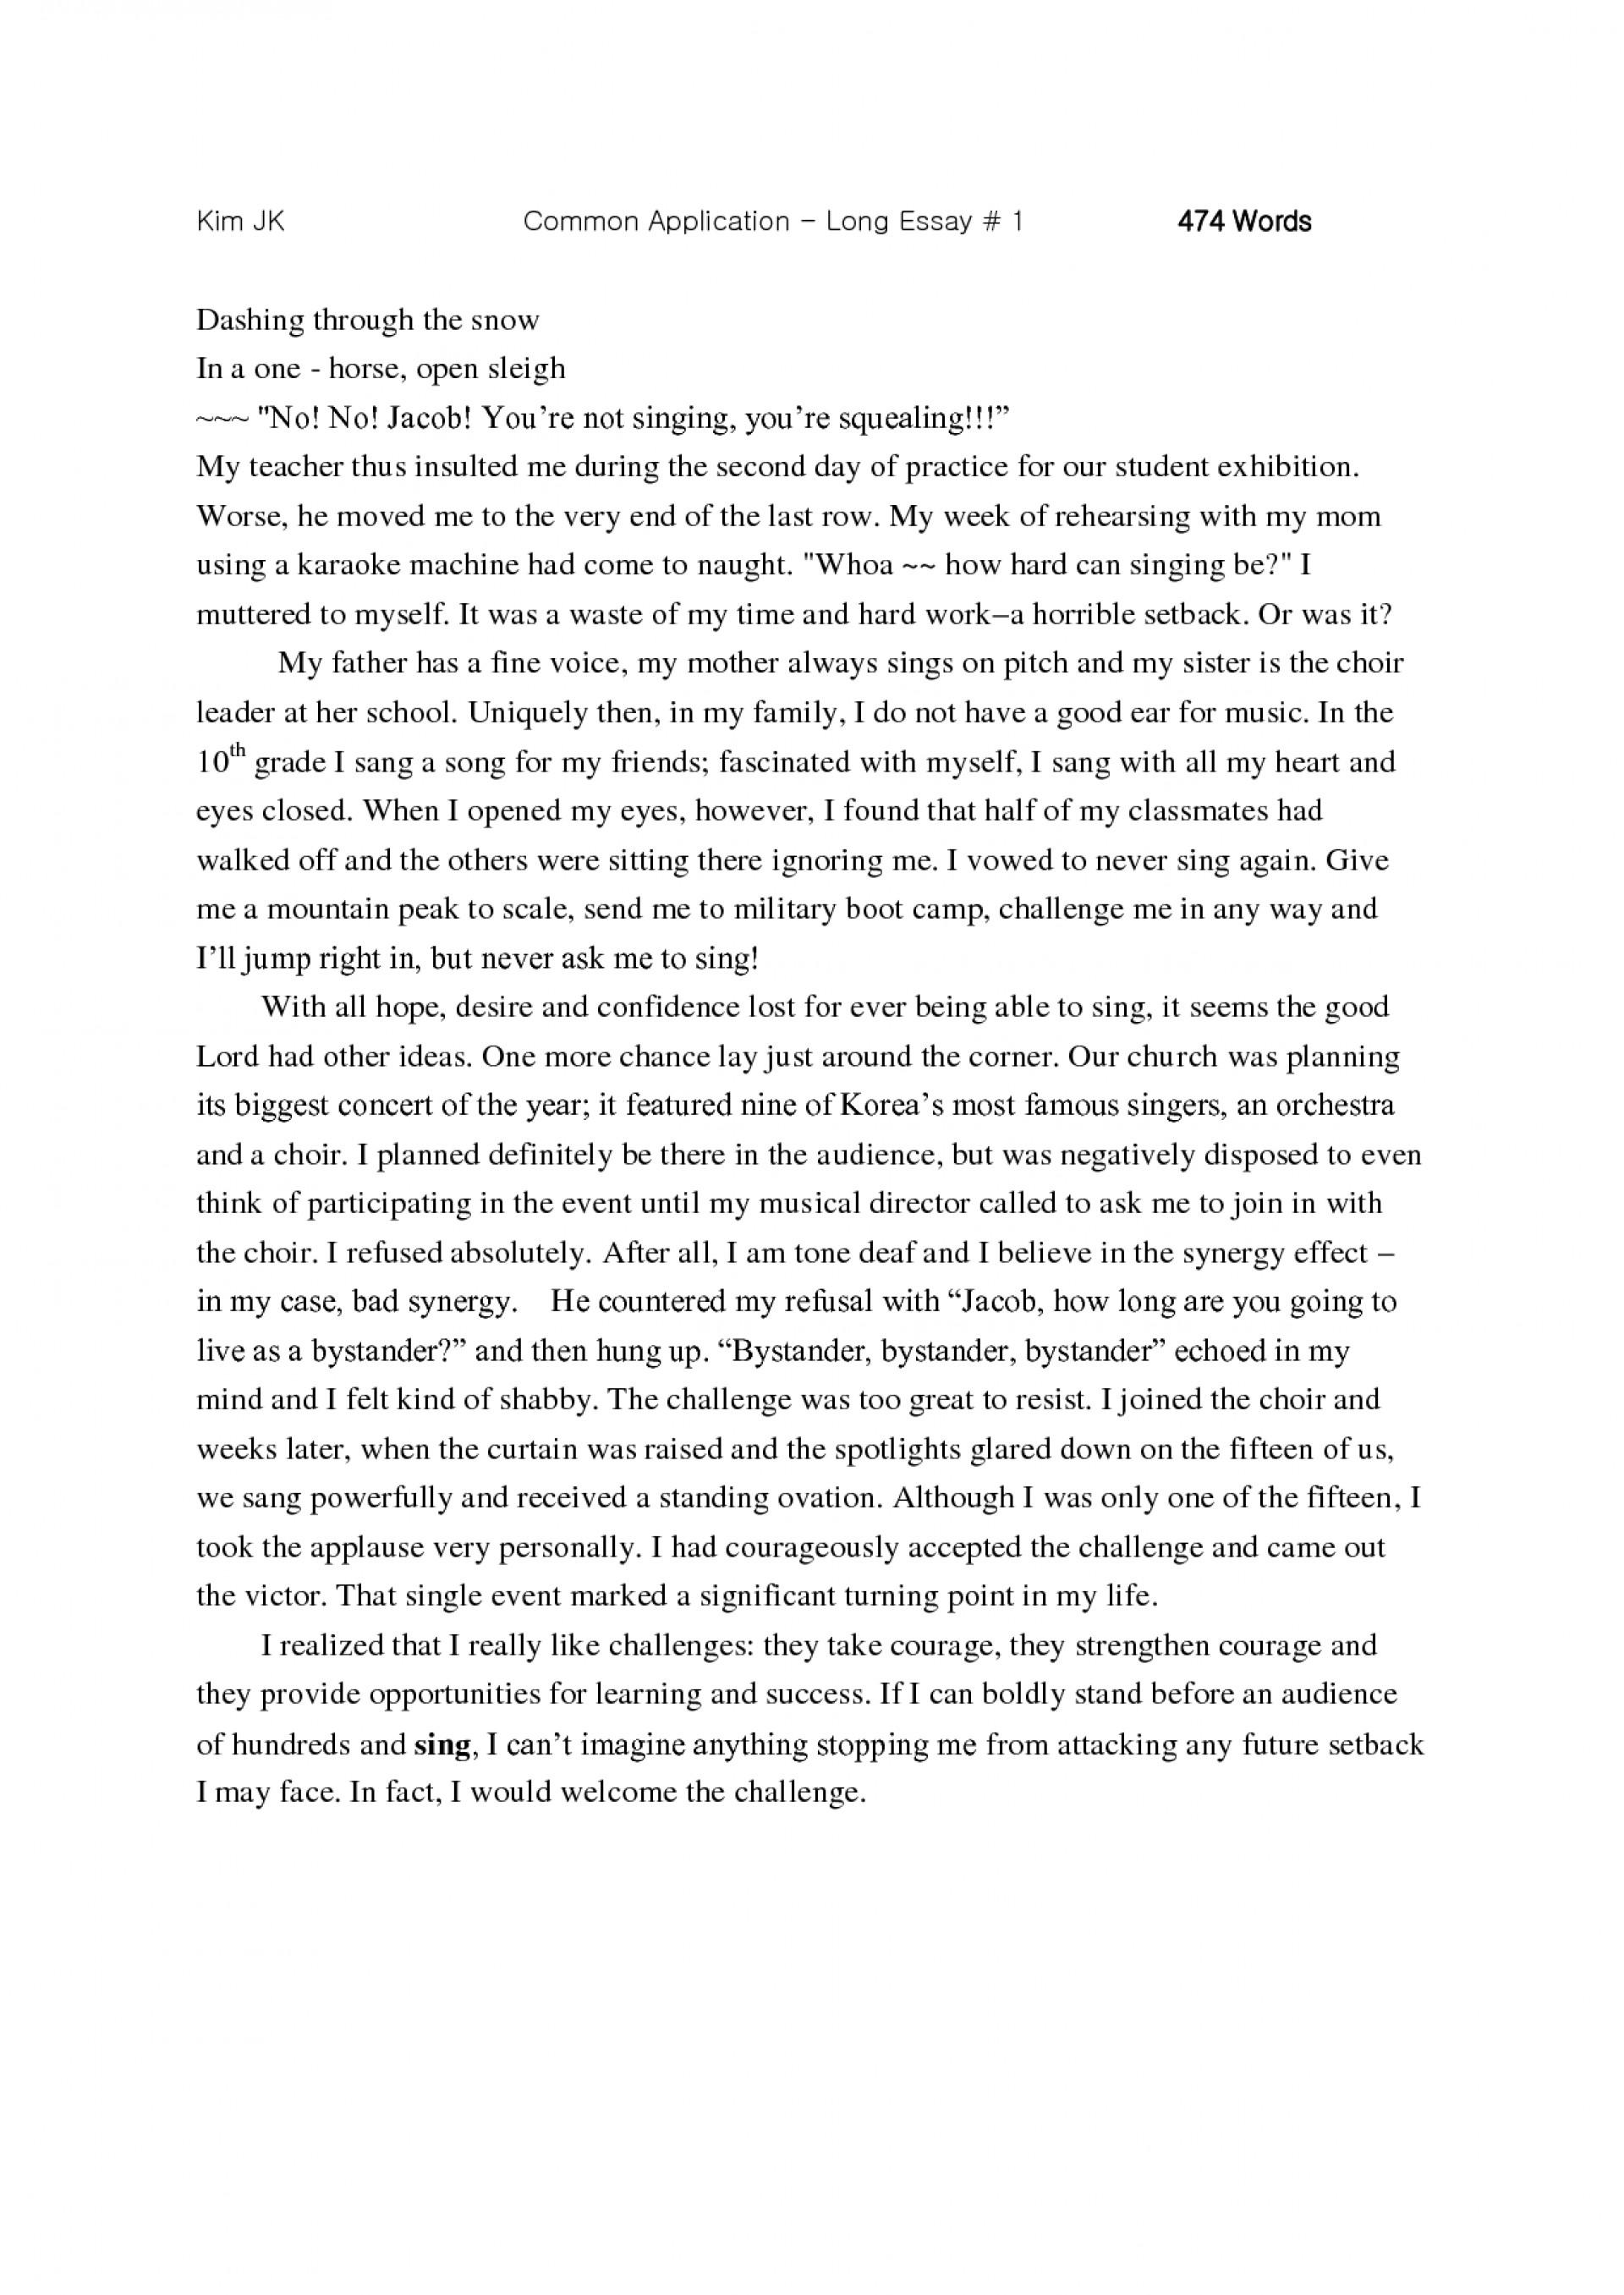 001 College Essay Word Limit Good Common App Essays Resume Writing Application Help Cnessayjuvi Impressive Count Admission 2019 1920